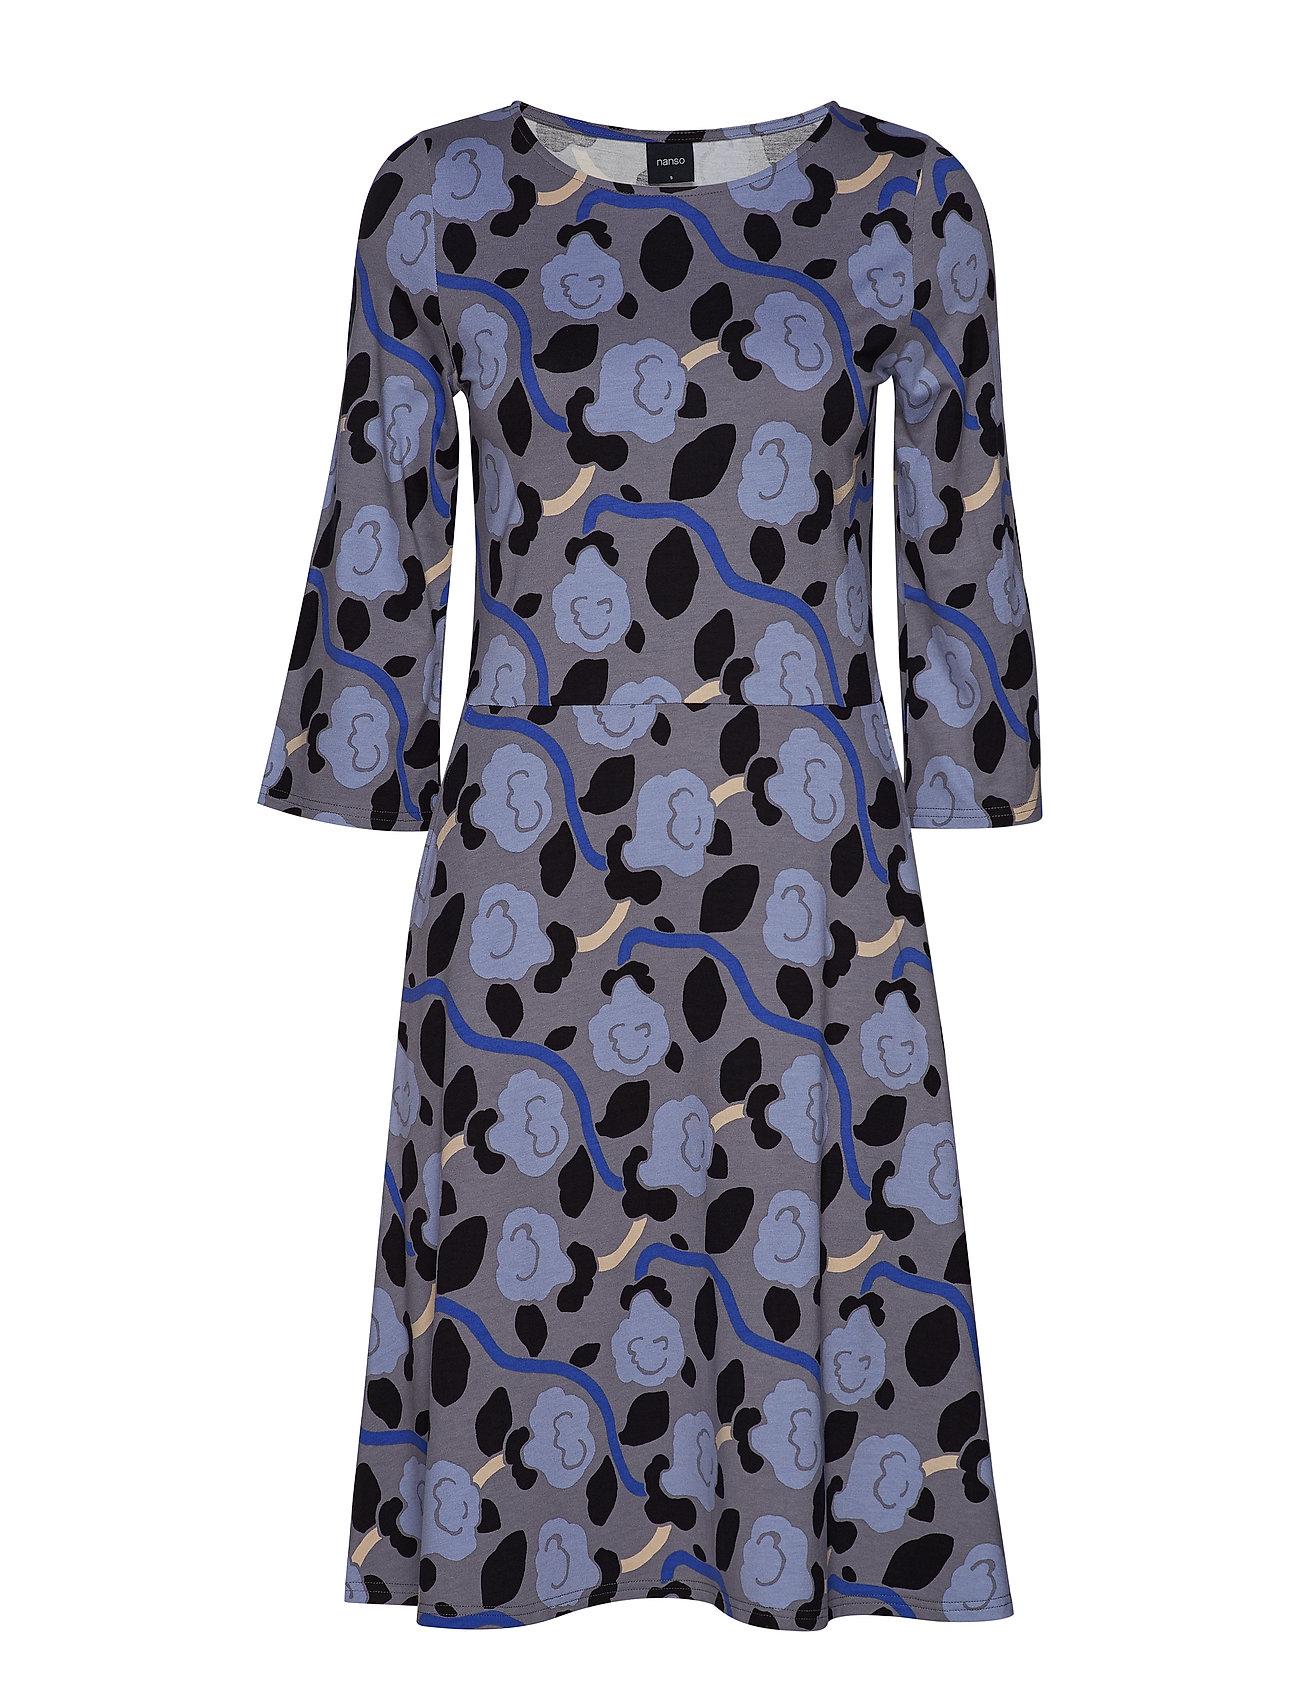 Nanso Ladies dress, Petunia - GREY